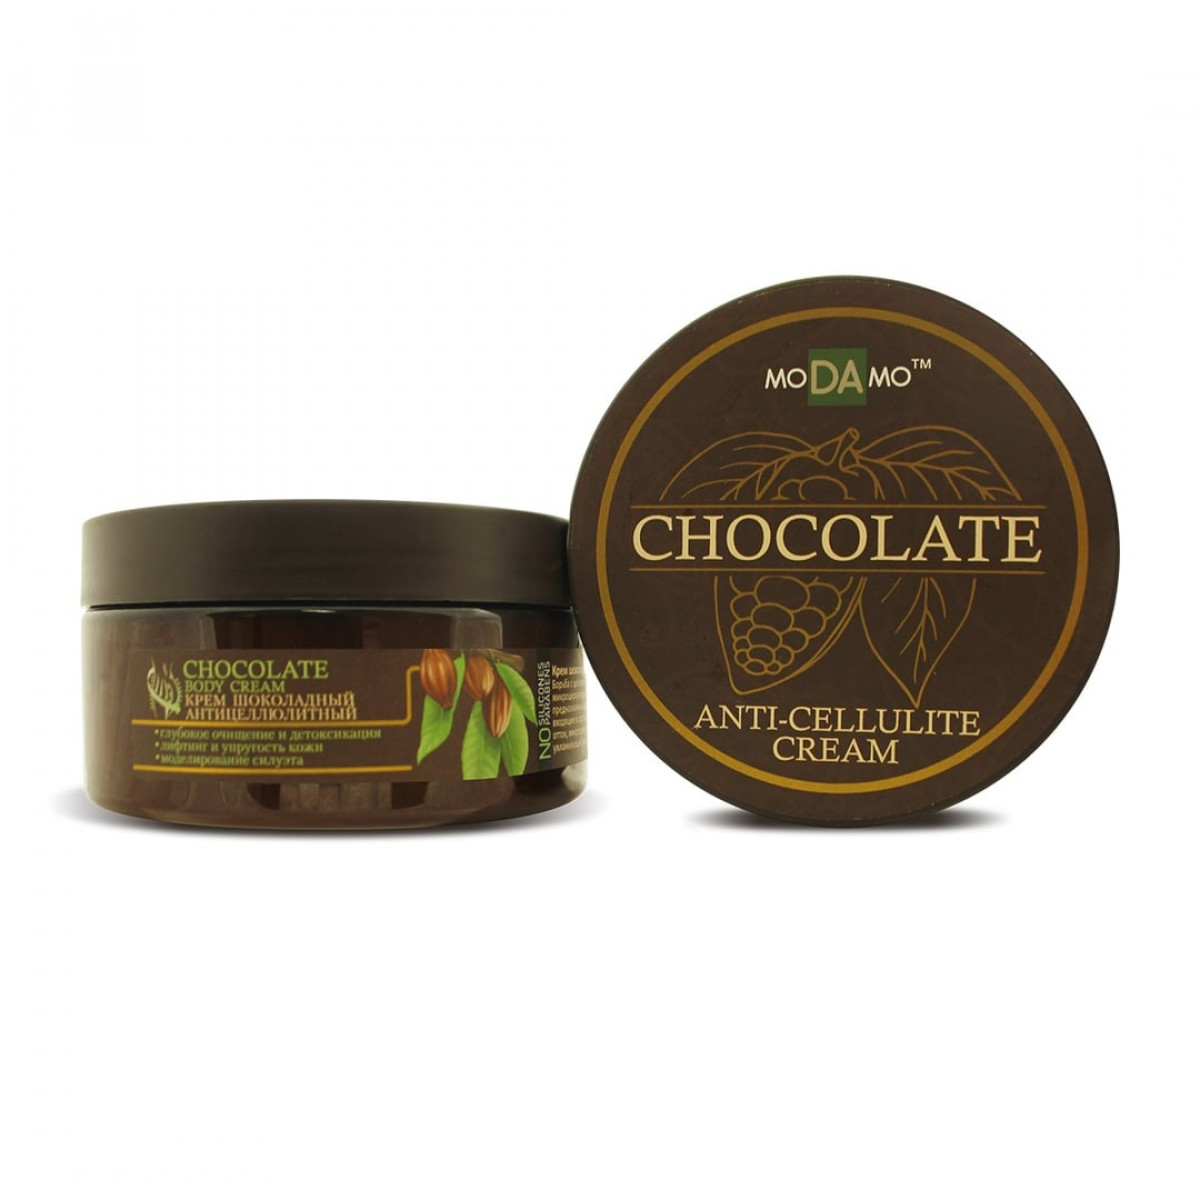 moDAmo Крем Шоколадный антицеллюлитный, 200 мл (moDAmo, Chocolate)